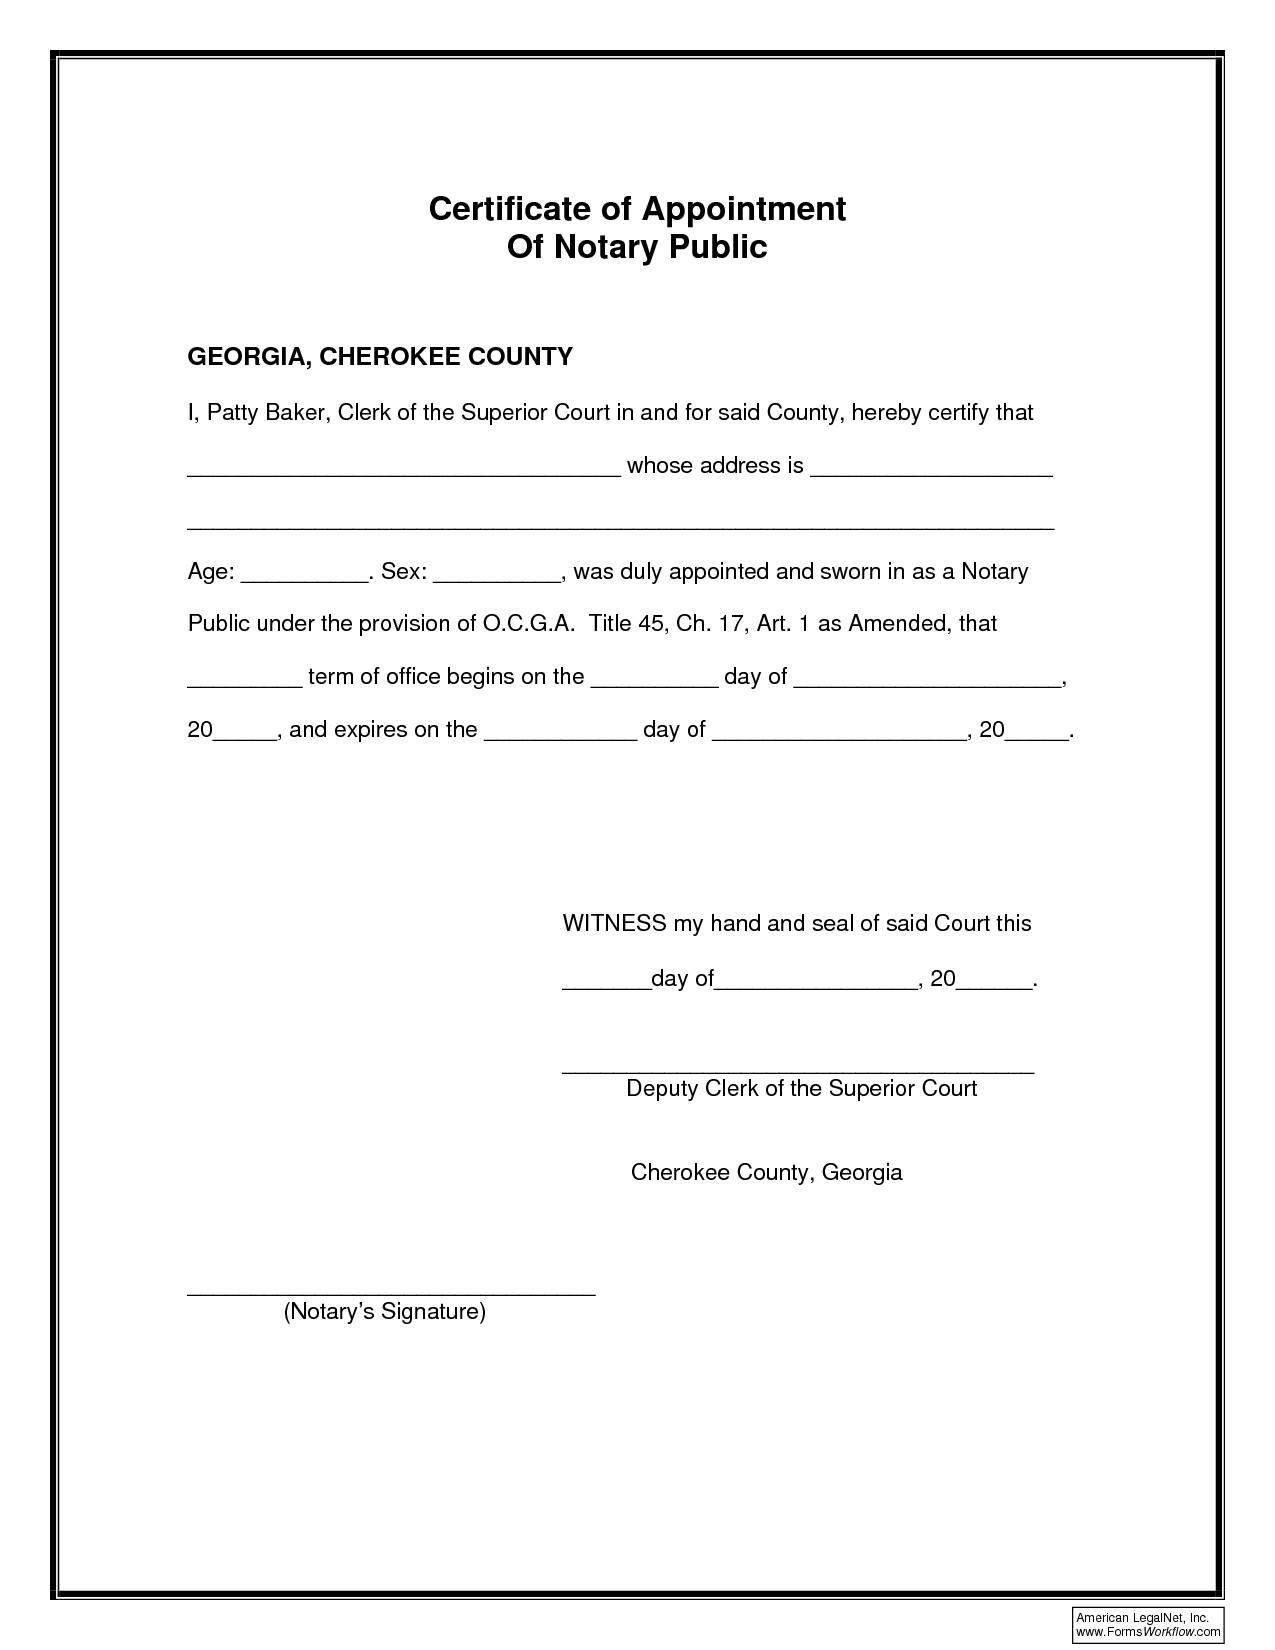 Notary Public Signature Template Texas